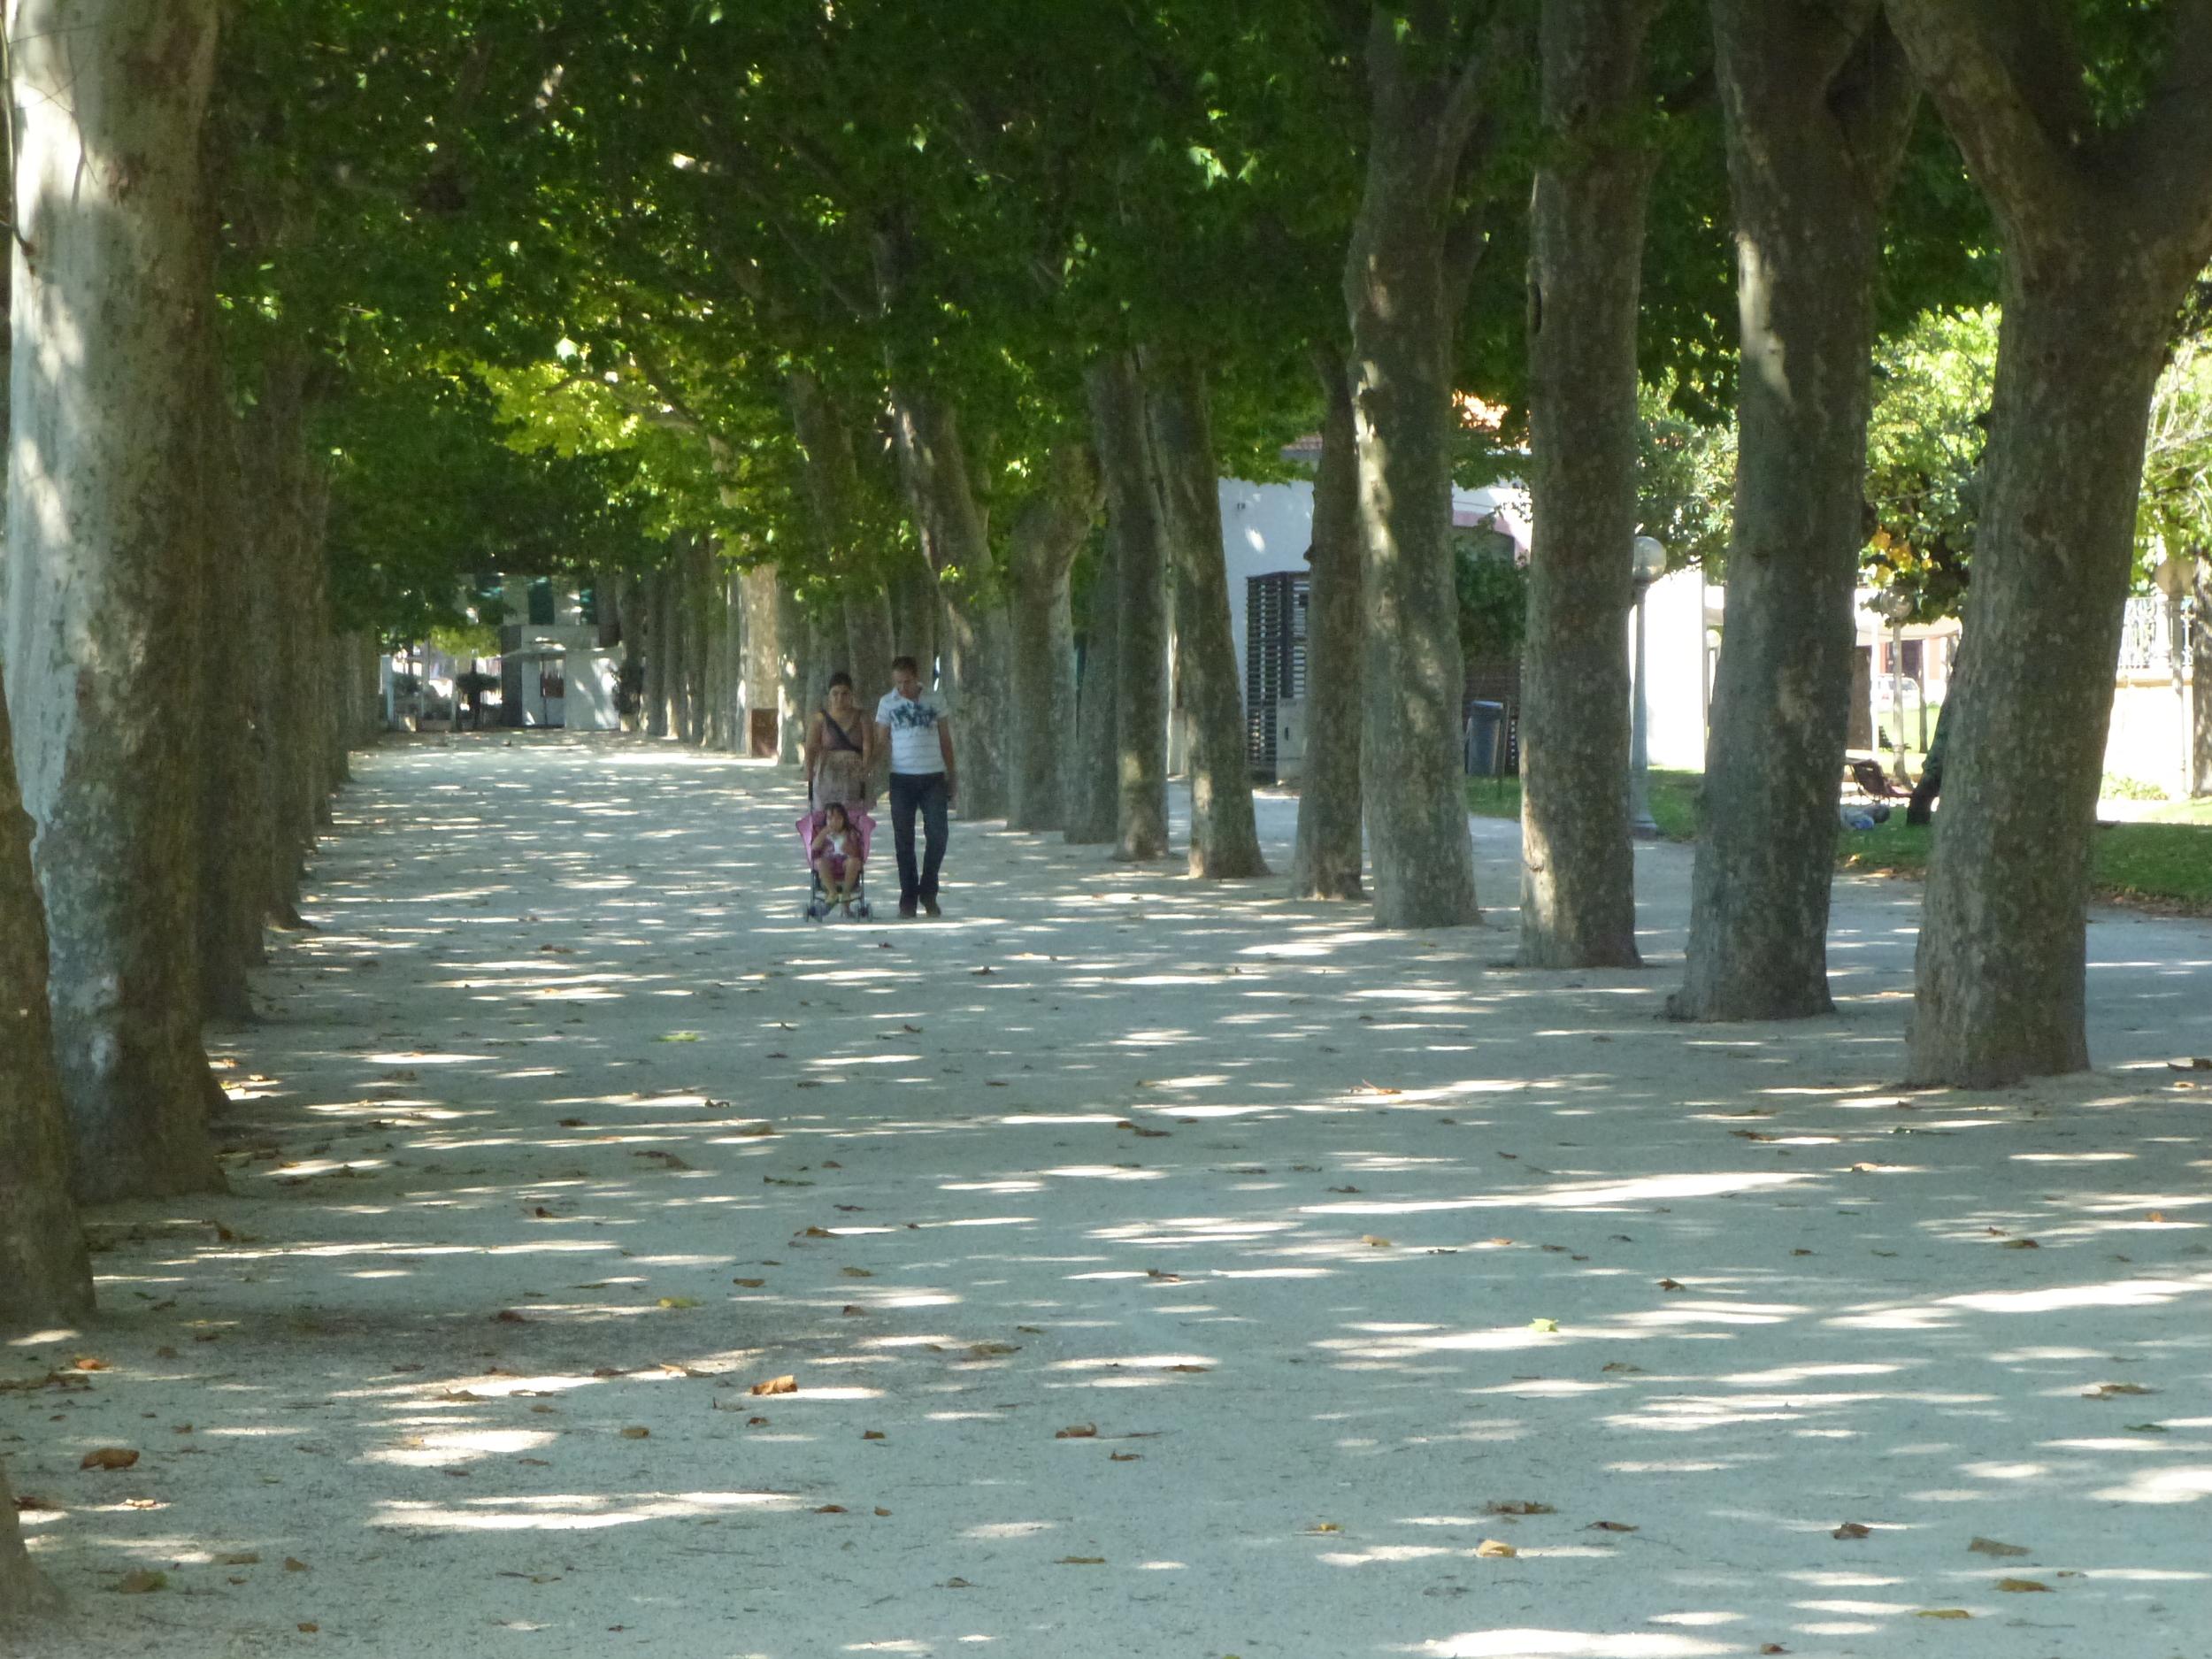 "Riverside walk in Coimbra, Portugal                0    0    1    5    31    WANdisco    1    1    35    14.0                          Normal    0                false    false    false       EN-US    JA    X-NONE                                                                                                                                                                                                                                                                                                                                                                                                                                                                                                                                                  /* Style Definitions */ table.MsoNormalTable {mso-style-name:""Table Normal""; mso-tstyle-rowband-size:0; mso-tstyle-colband-size:0; mso-style-noshow:yes; mso-style-priority:99; mso-style-parent:""""; mso-padding-alt:0cm 5.4pt 0cm 5.4pt; mso-para-margin:0cm; mso-para-margin-bottom:.0001pt; mso-pagination:widow-orphan; font-size:12.0pt; font-family:Cambria; mso-ascii-font-family:Cambria; mso-ascii-theme-font:minor-latin; mso-hansi-font-family:Cambria; mso-hansi-theme-font:minor-latin; mso-ansi-language:EN-US;}"